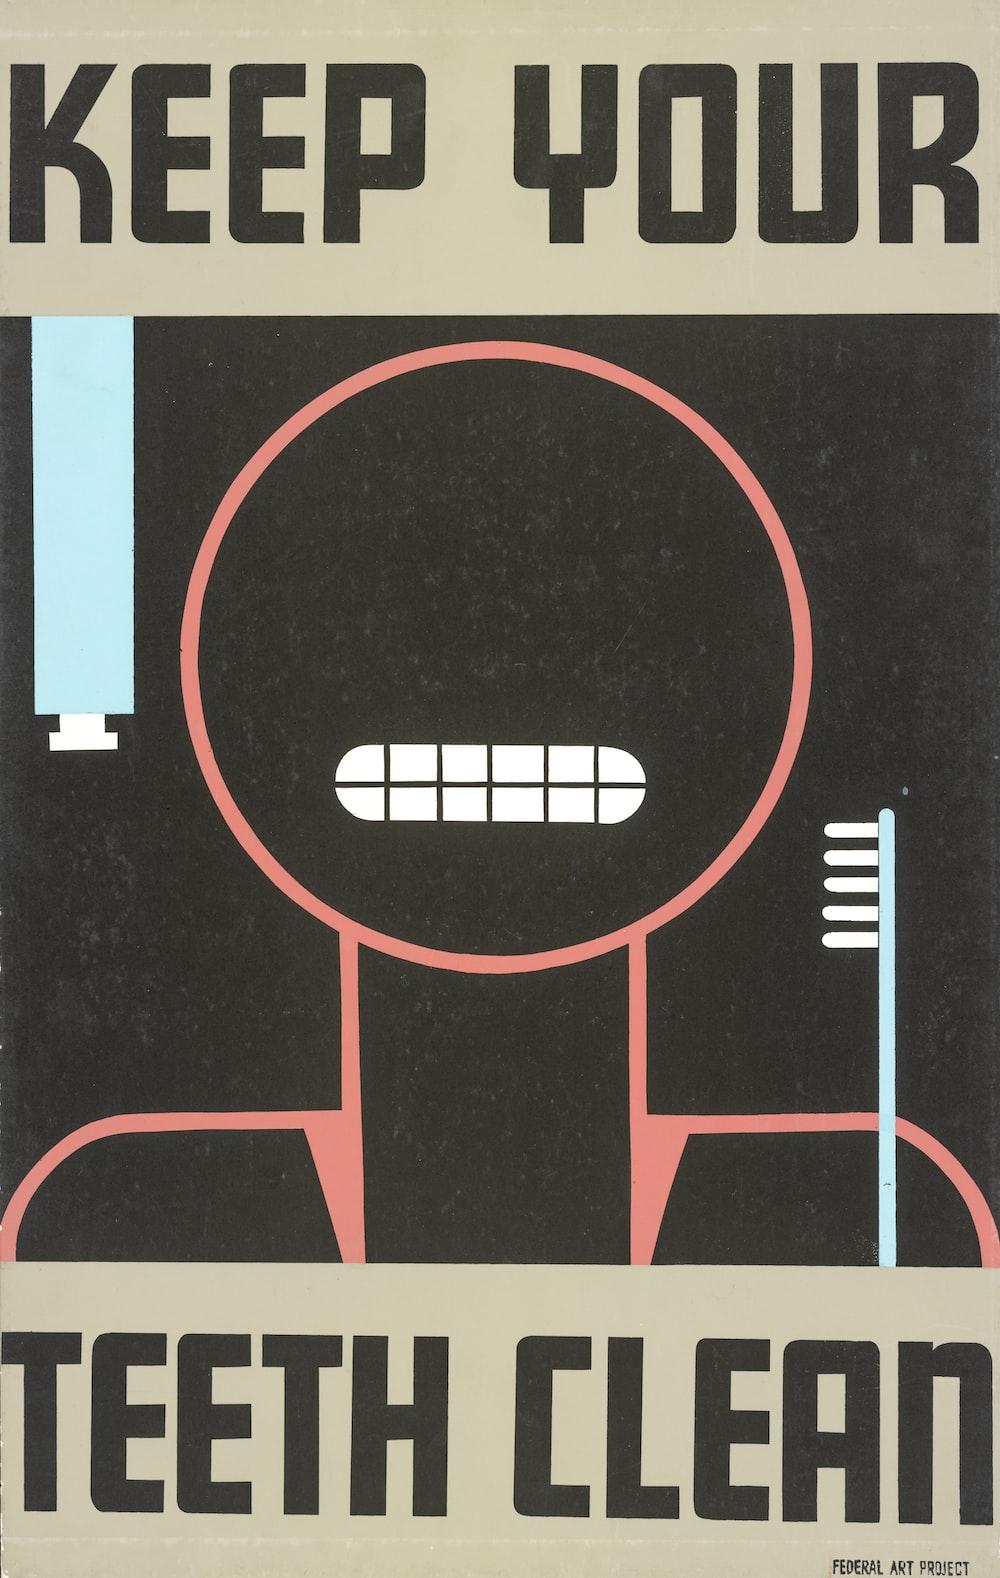 Keep Your Teeth Clean. WPA poster.